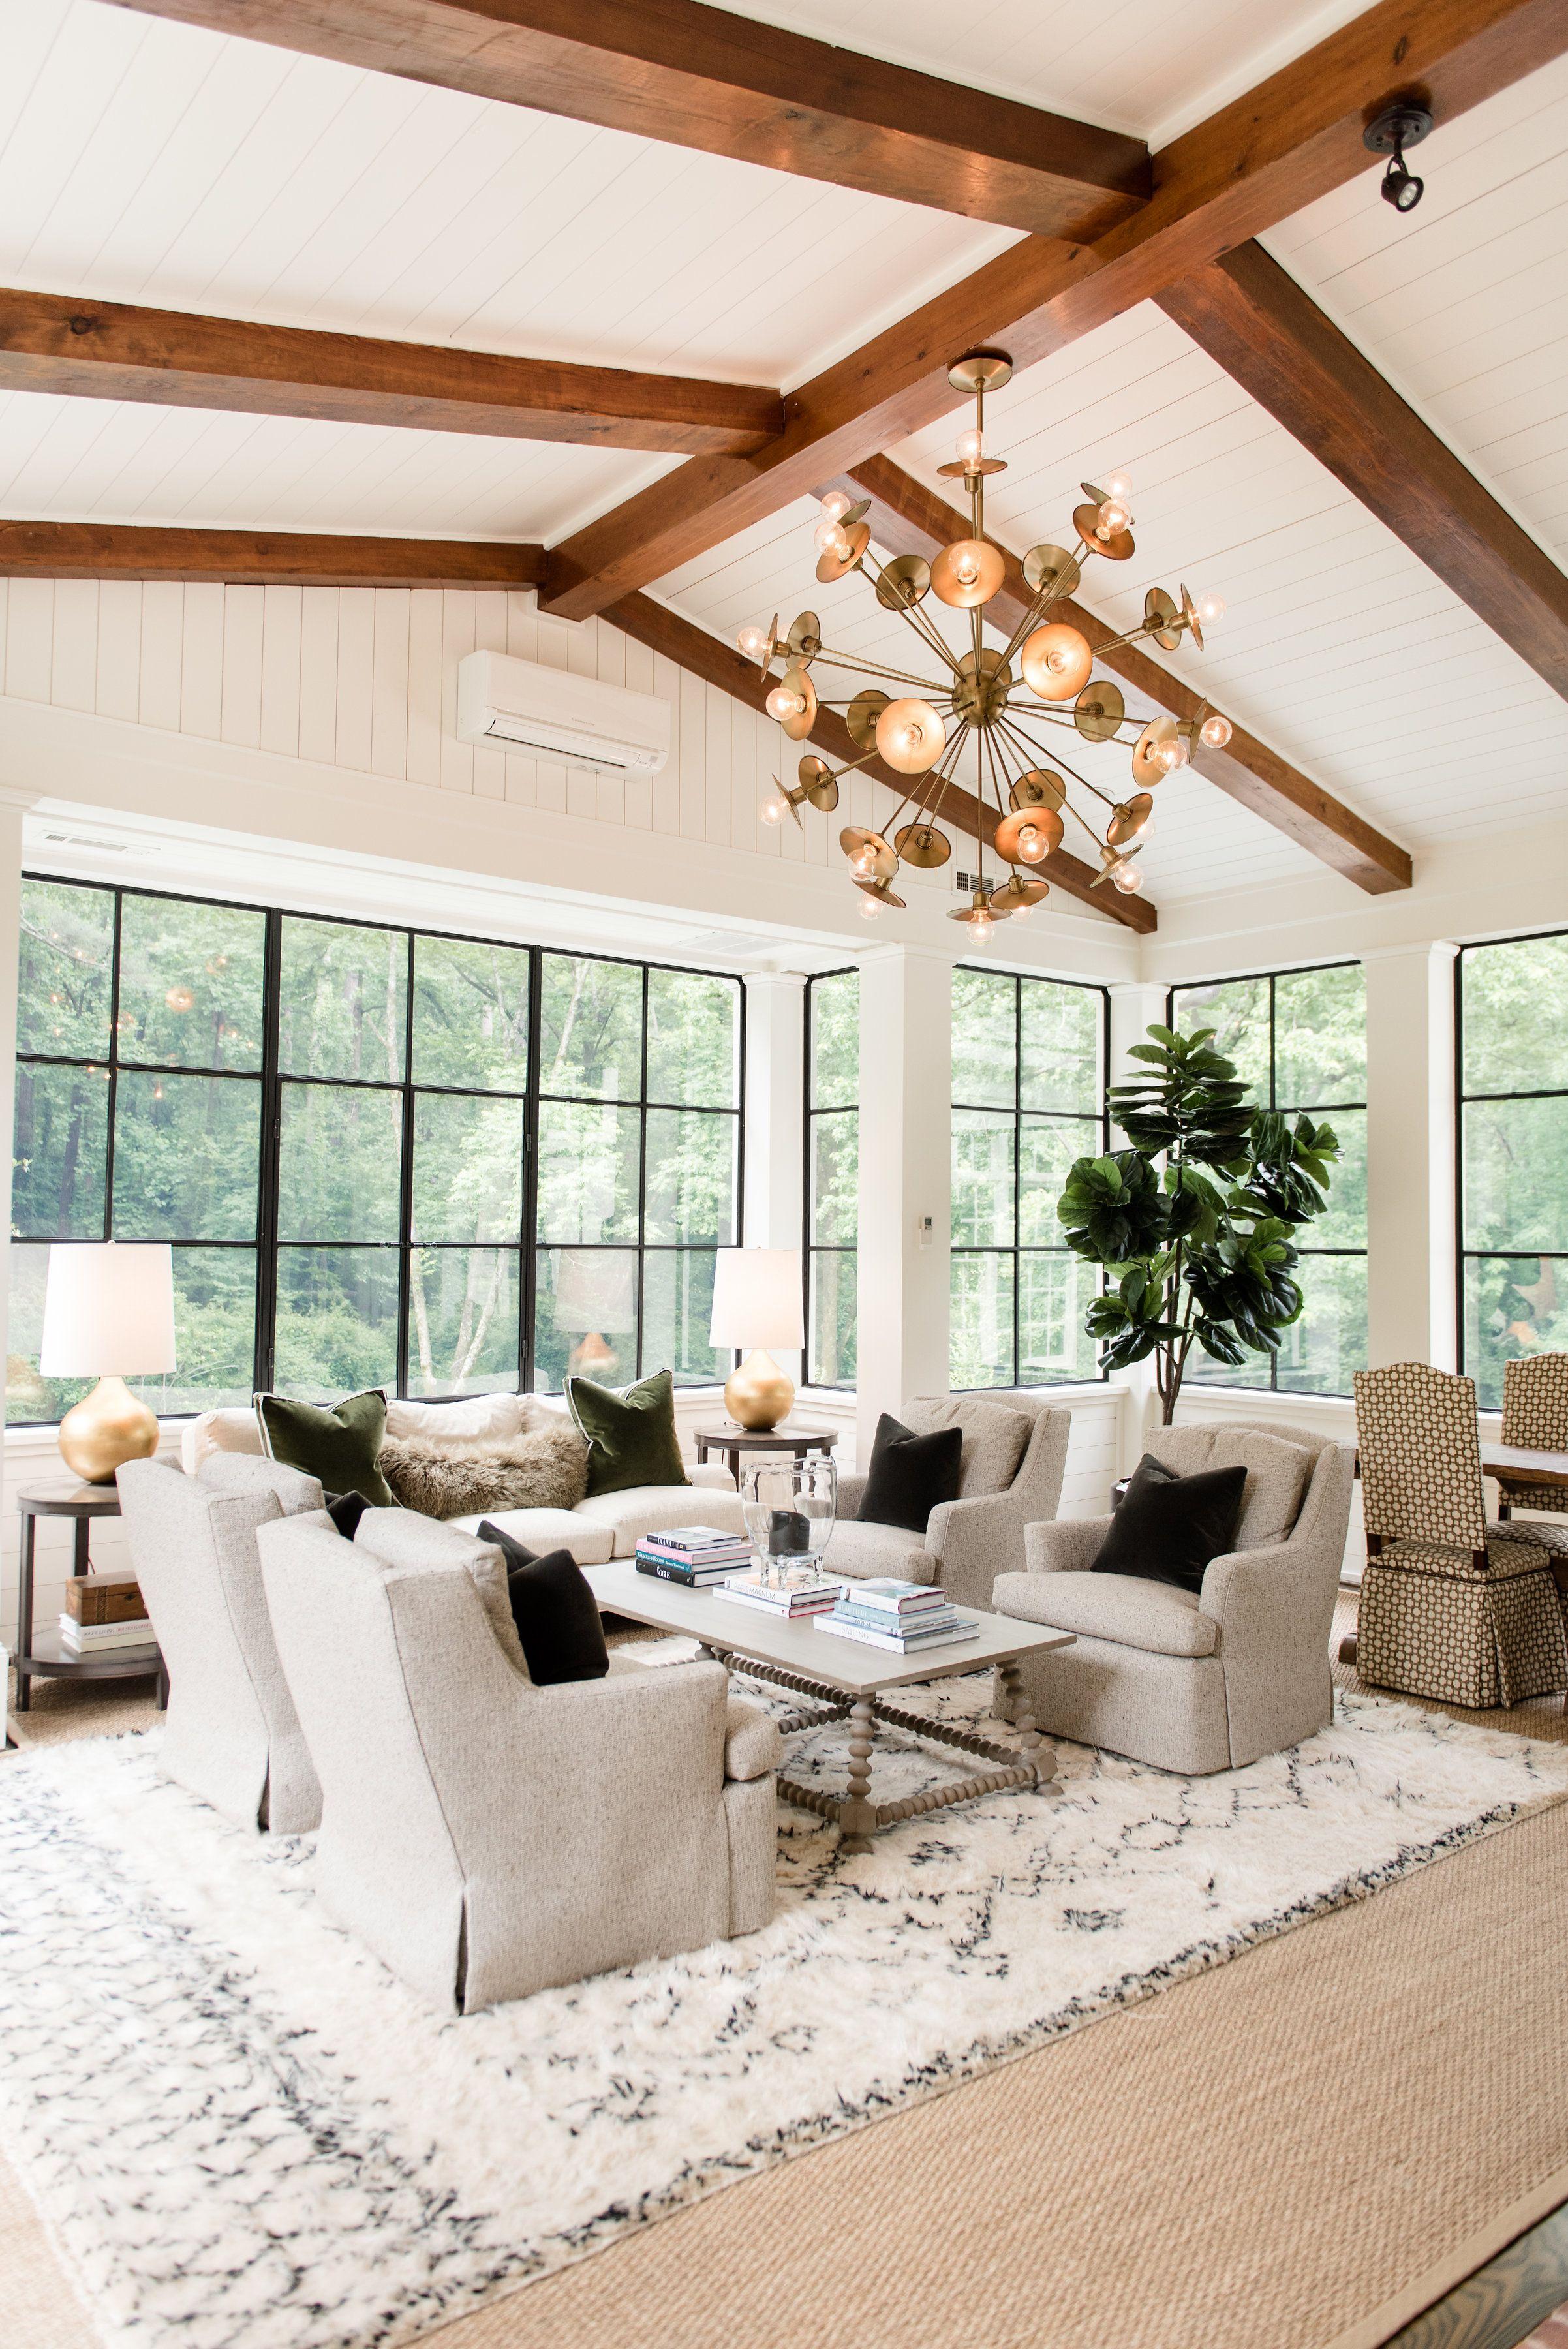 The Sunroom Decor Inspiration You Need   home decor ...